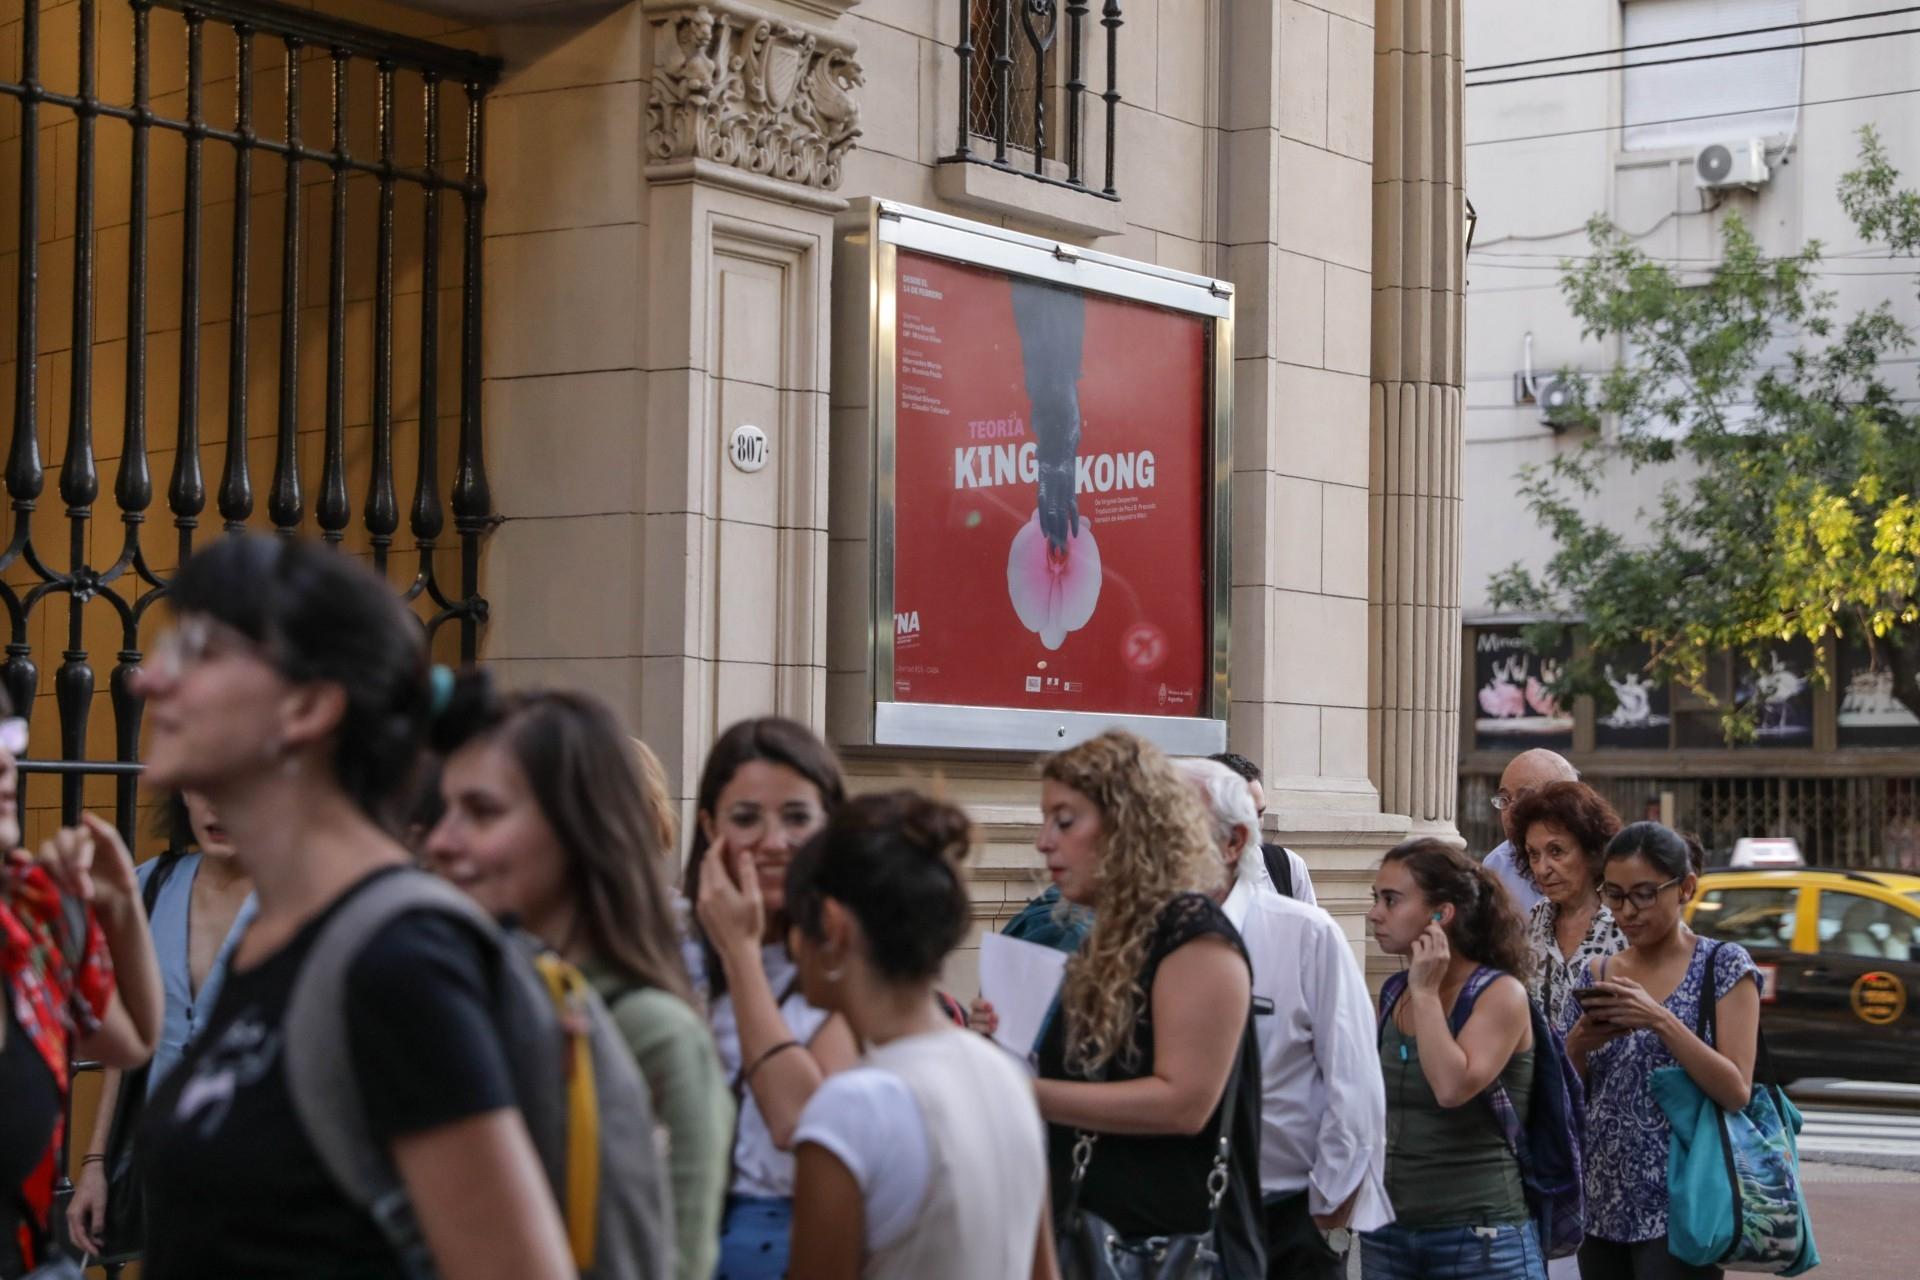 Diseño de afiches Teatro Nacional Argentino - Teatro Cervantes - Teoría King Kong